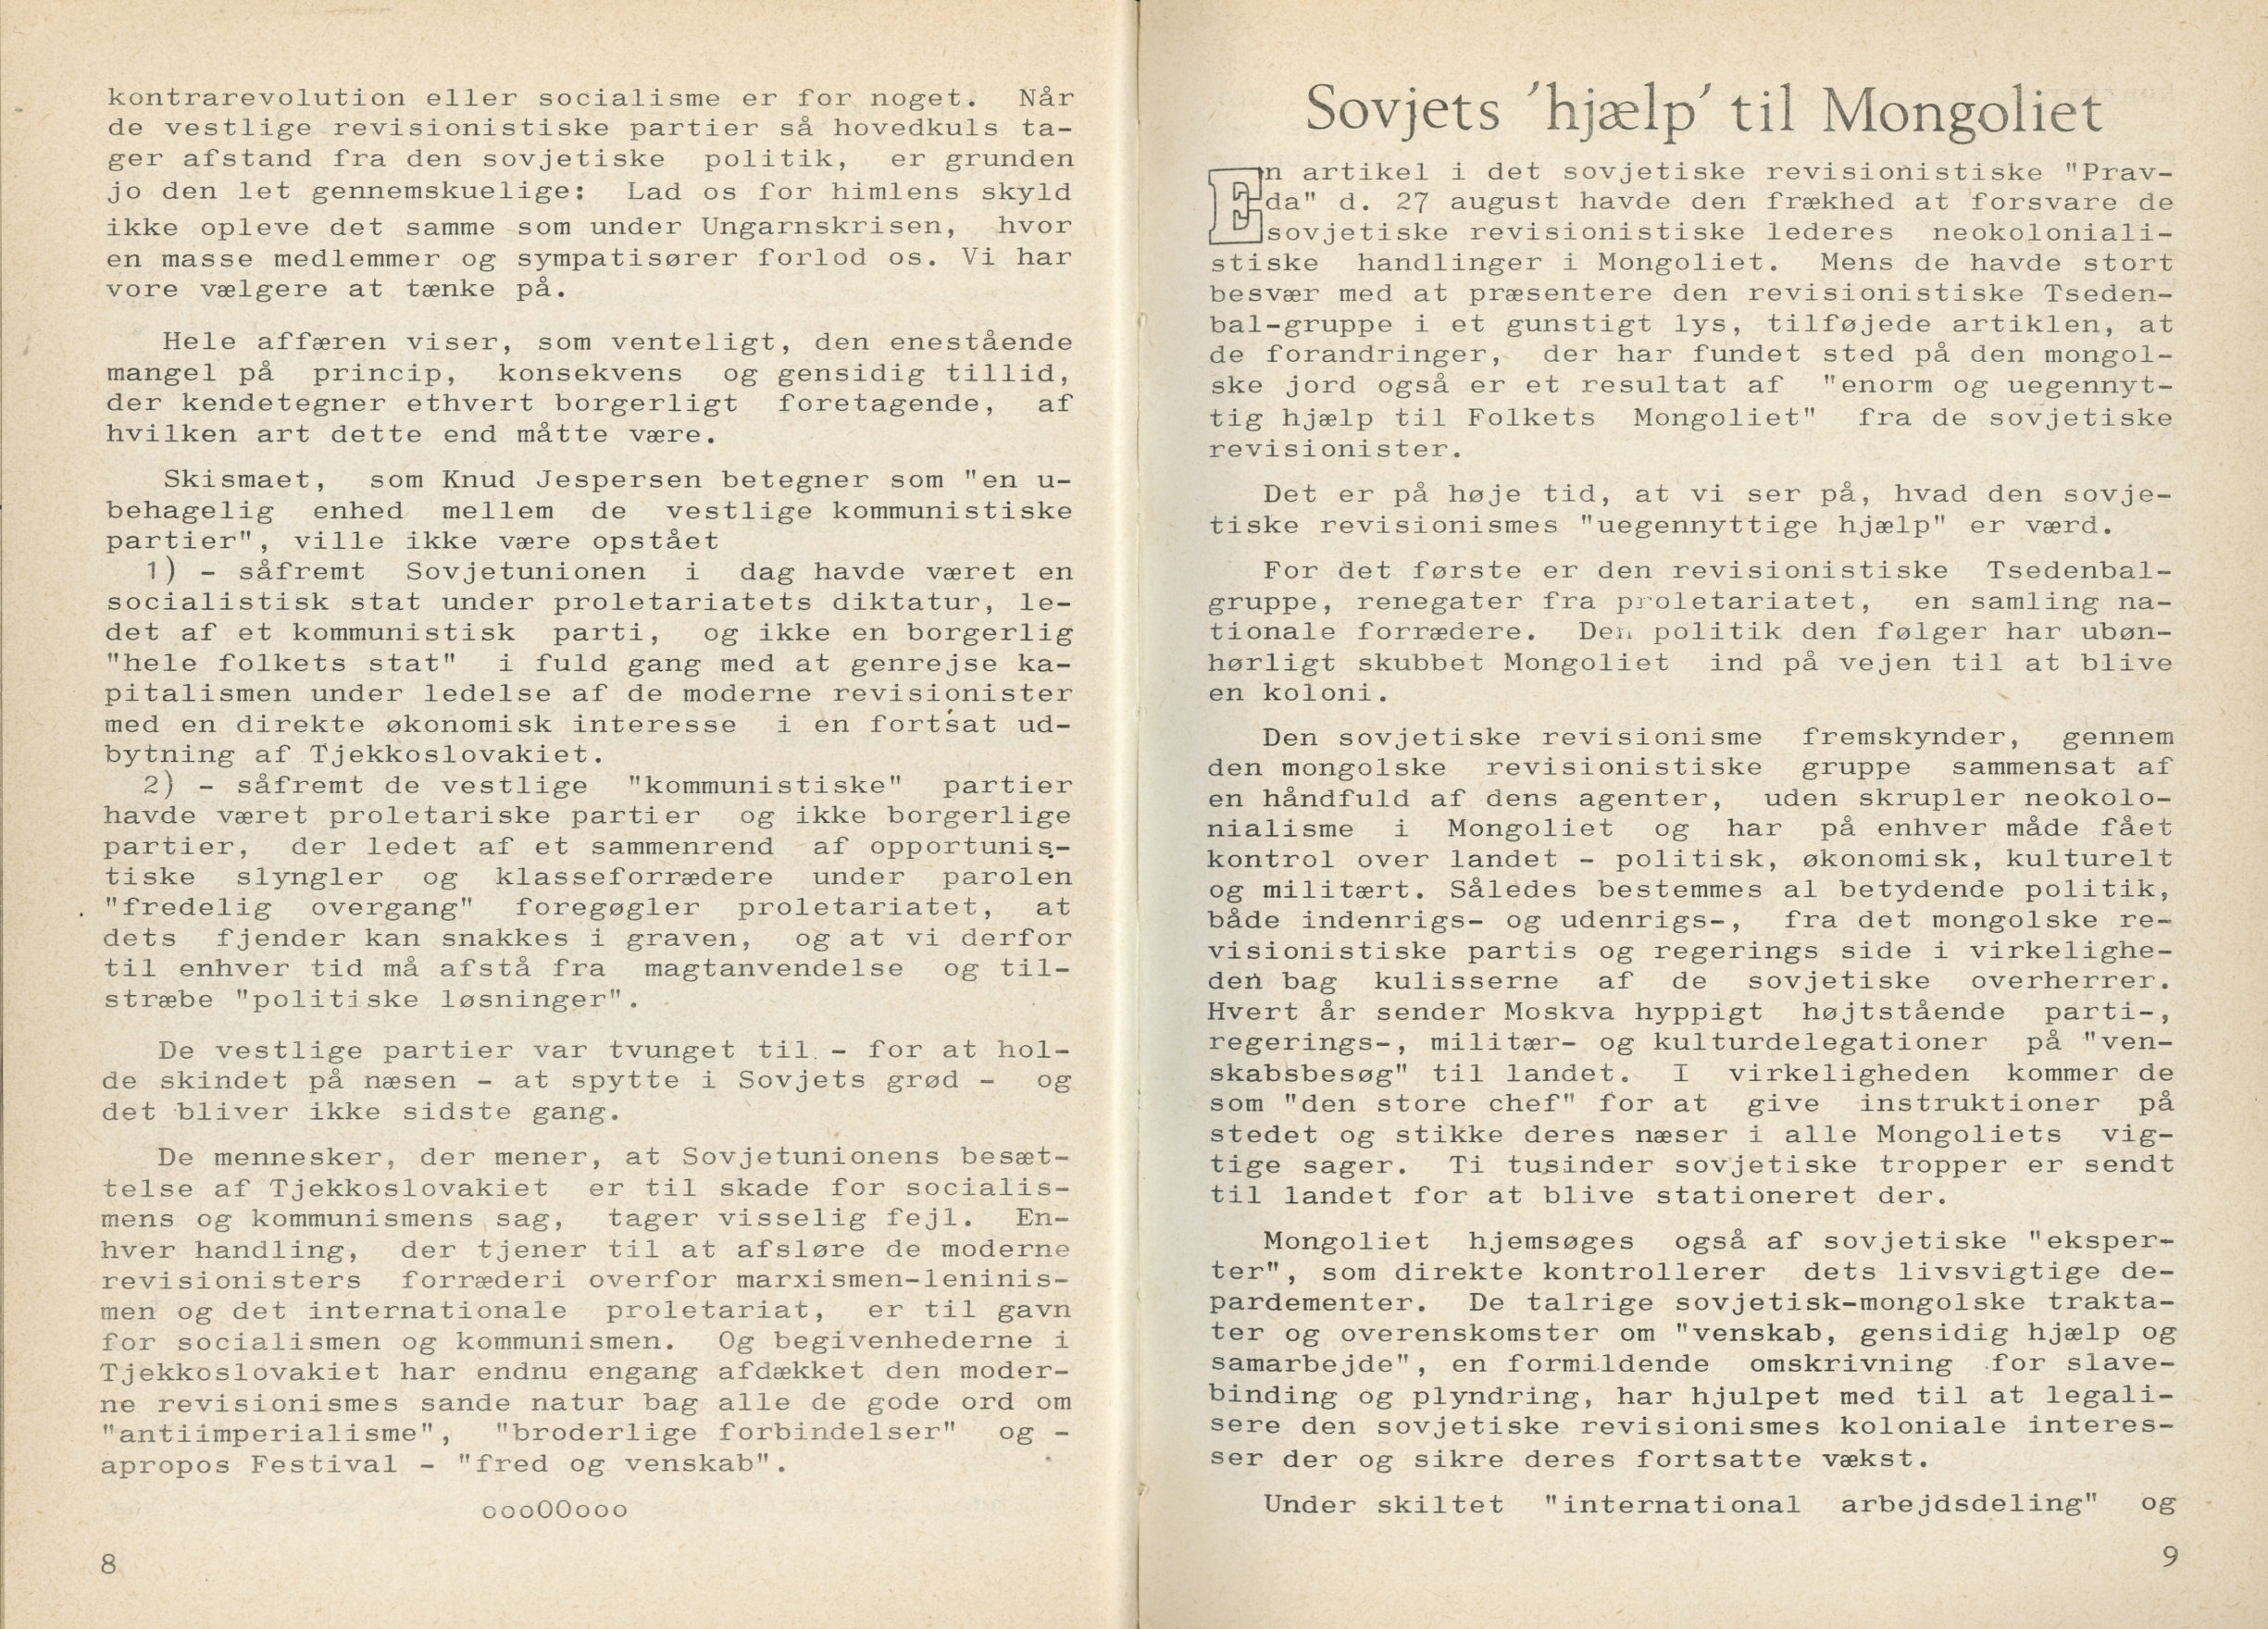 Ungkommunisten1968, nr. 9, s. 8-9.